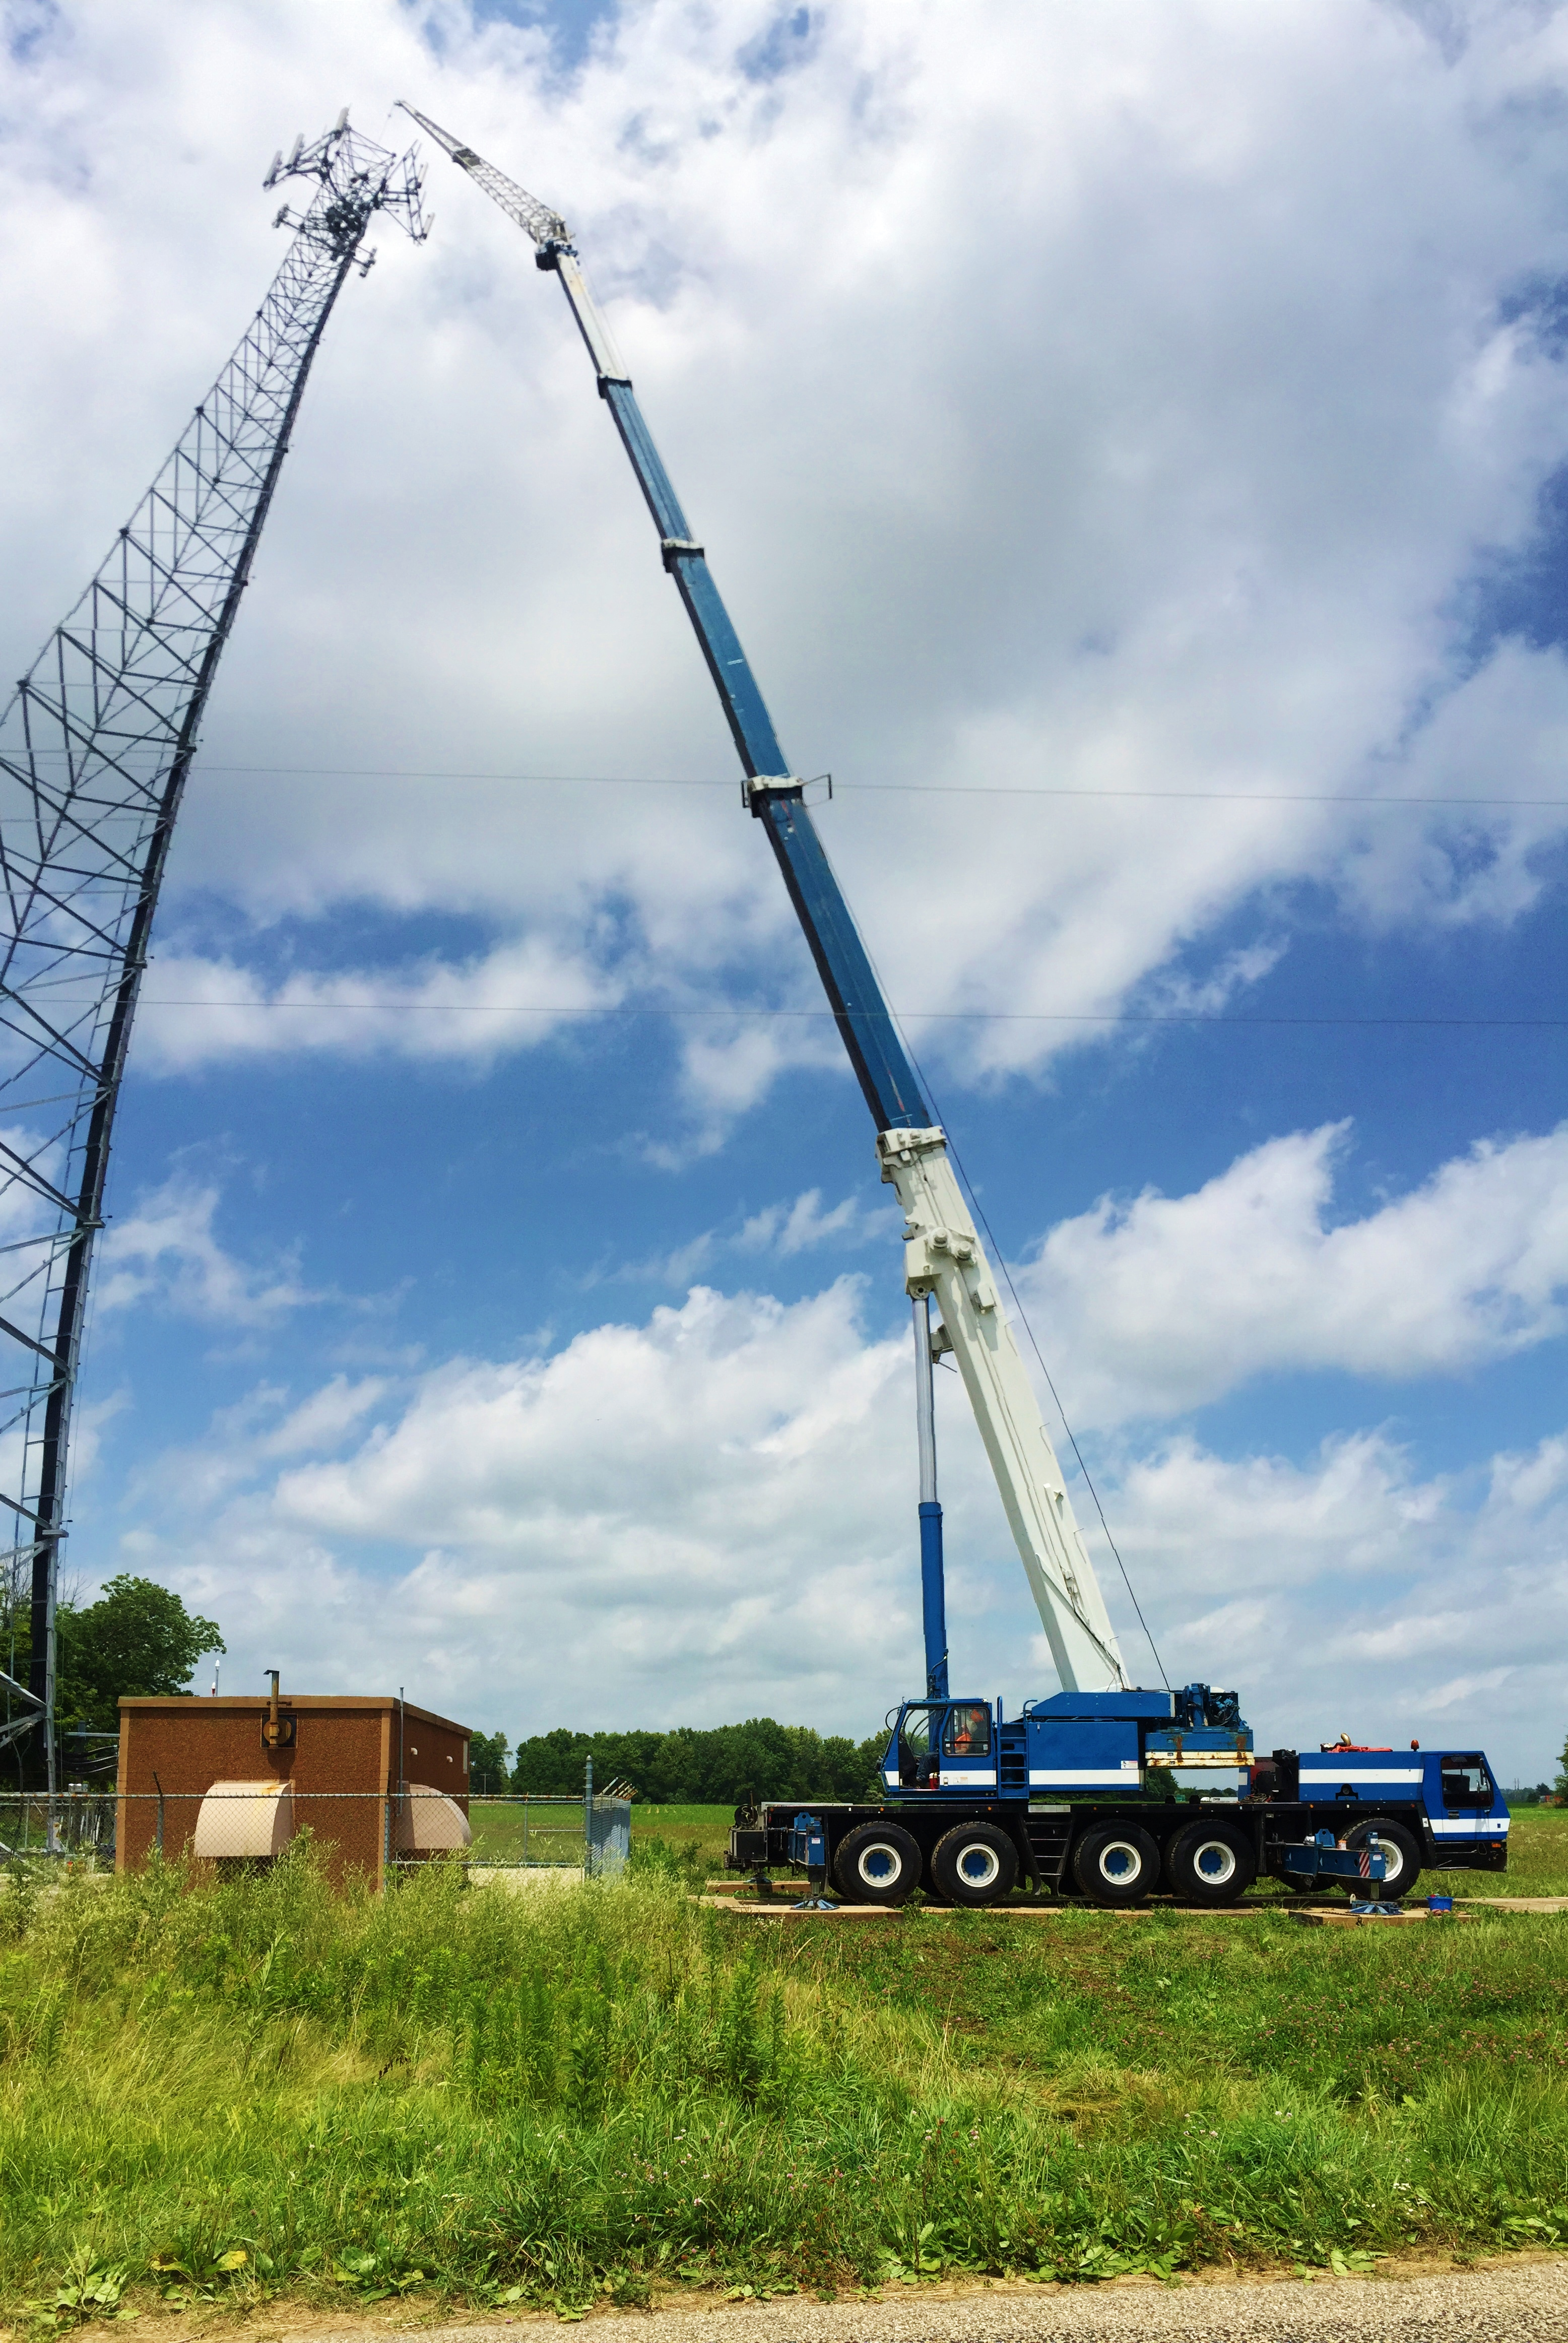 175 ton crane reaches high to hoist new antennas for a cell tower.